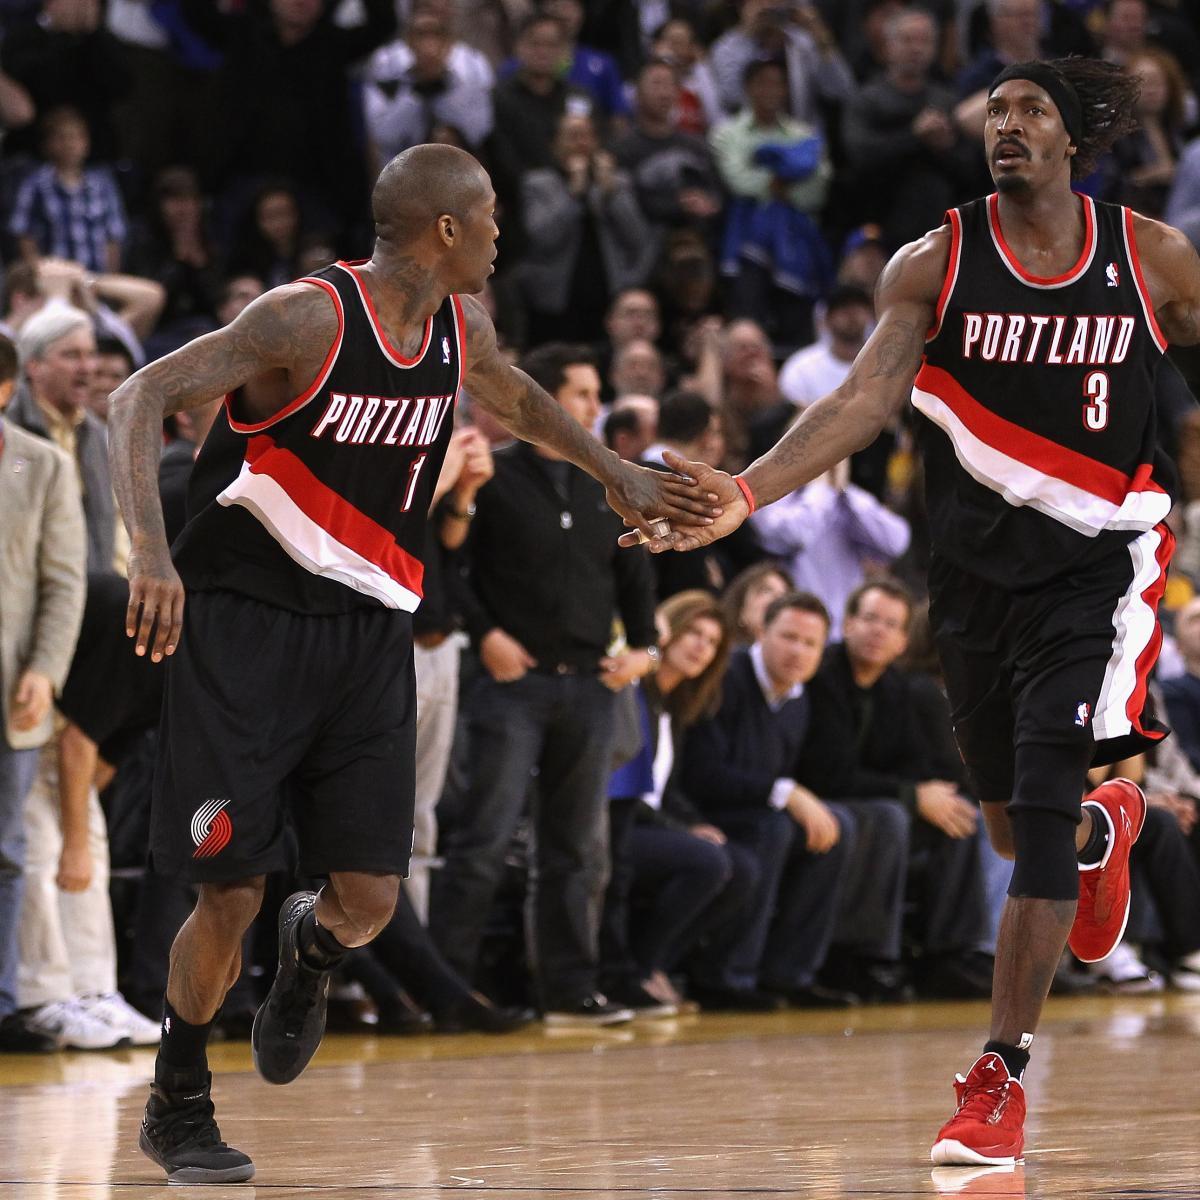 Portland Trail Blazers: Why Jamal Crawford May Not Return